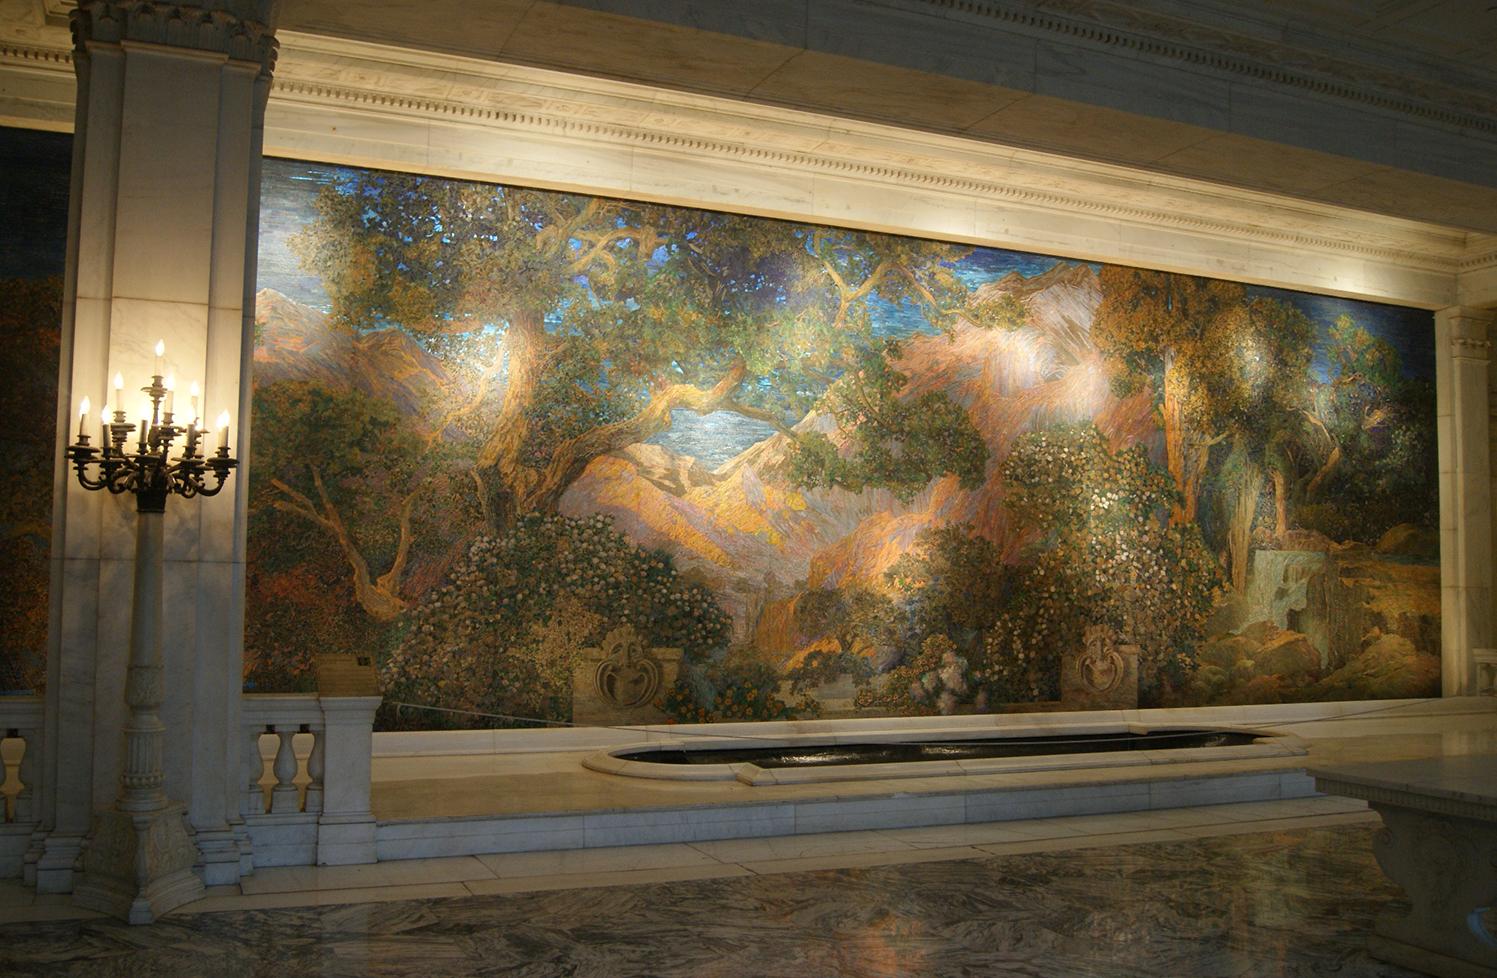 The Dream Garden mosaic